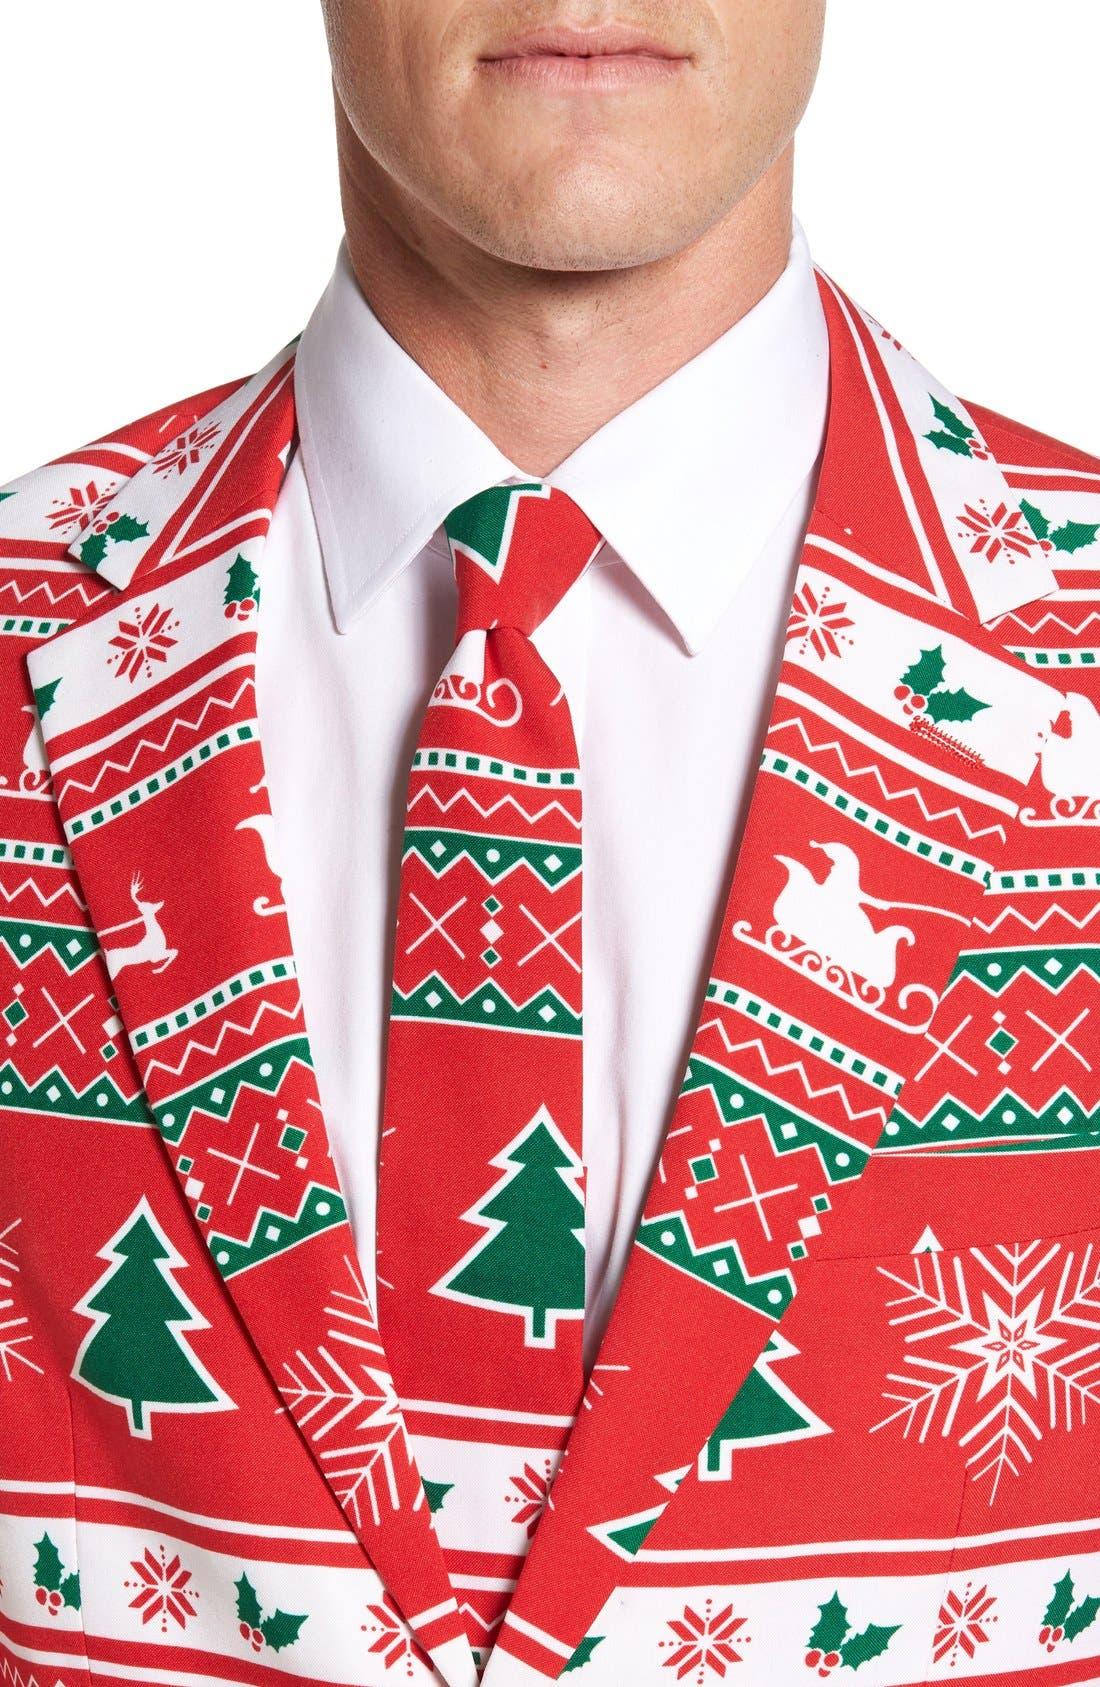 'Winter Wonderland' Trim Fit Two-Piece Suit with Tie,                             Alternate thumbnail 4, color,                             601